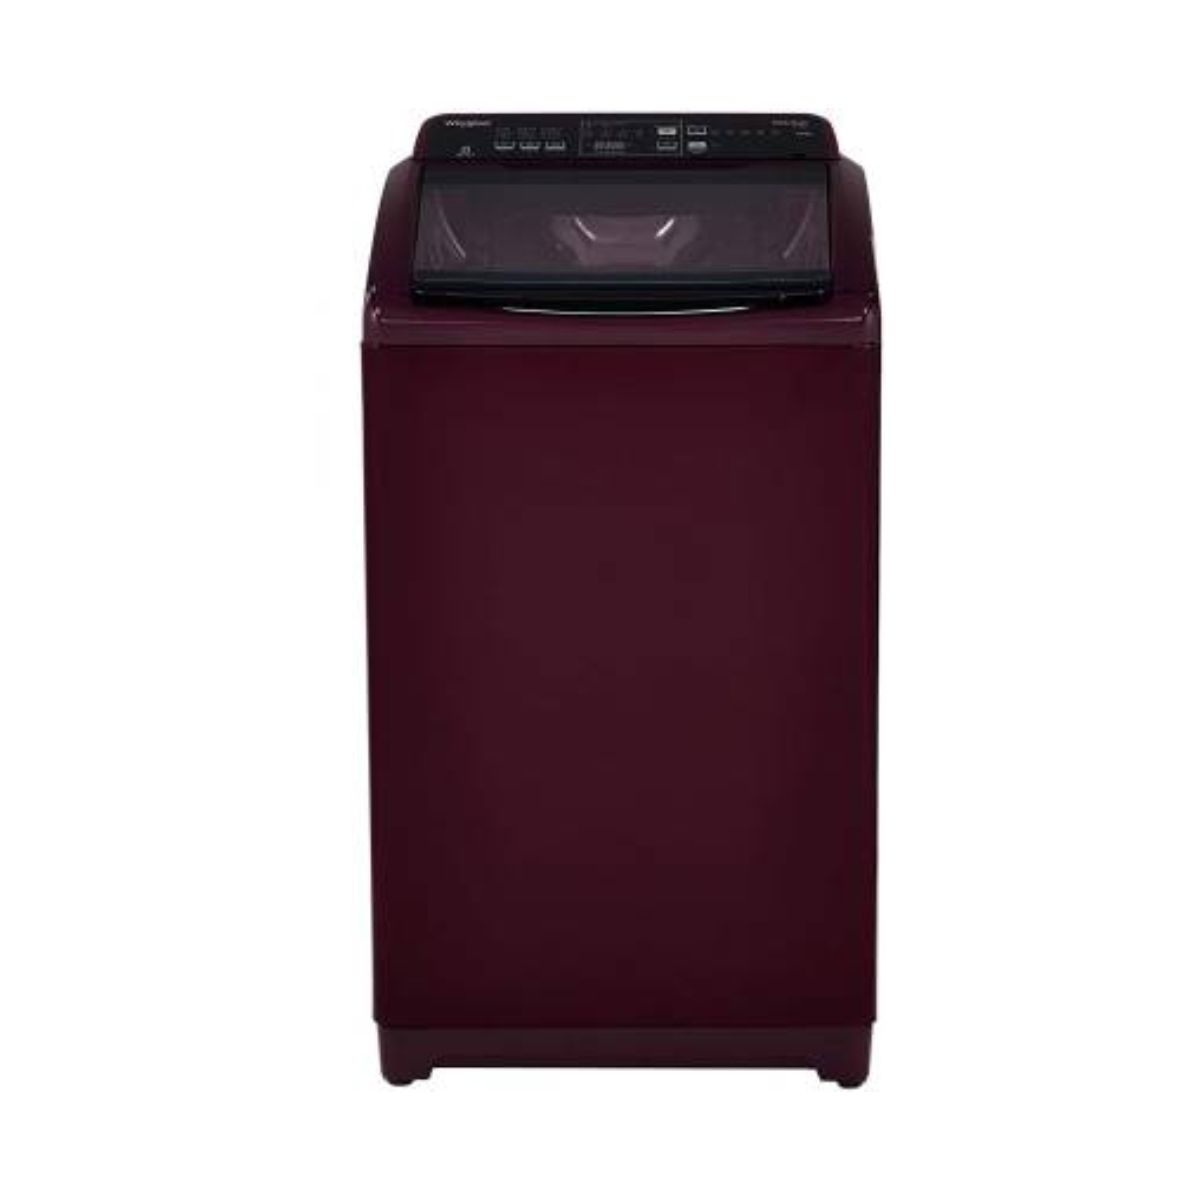 Whirlpool 7 kg Fully-Automatic மேலே Loading Washing Machine wine (WHITEMAGIC ELITE)